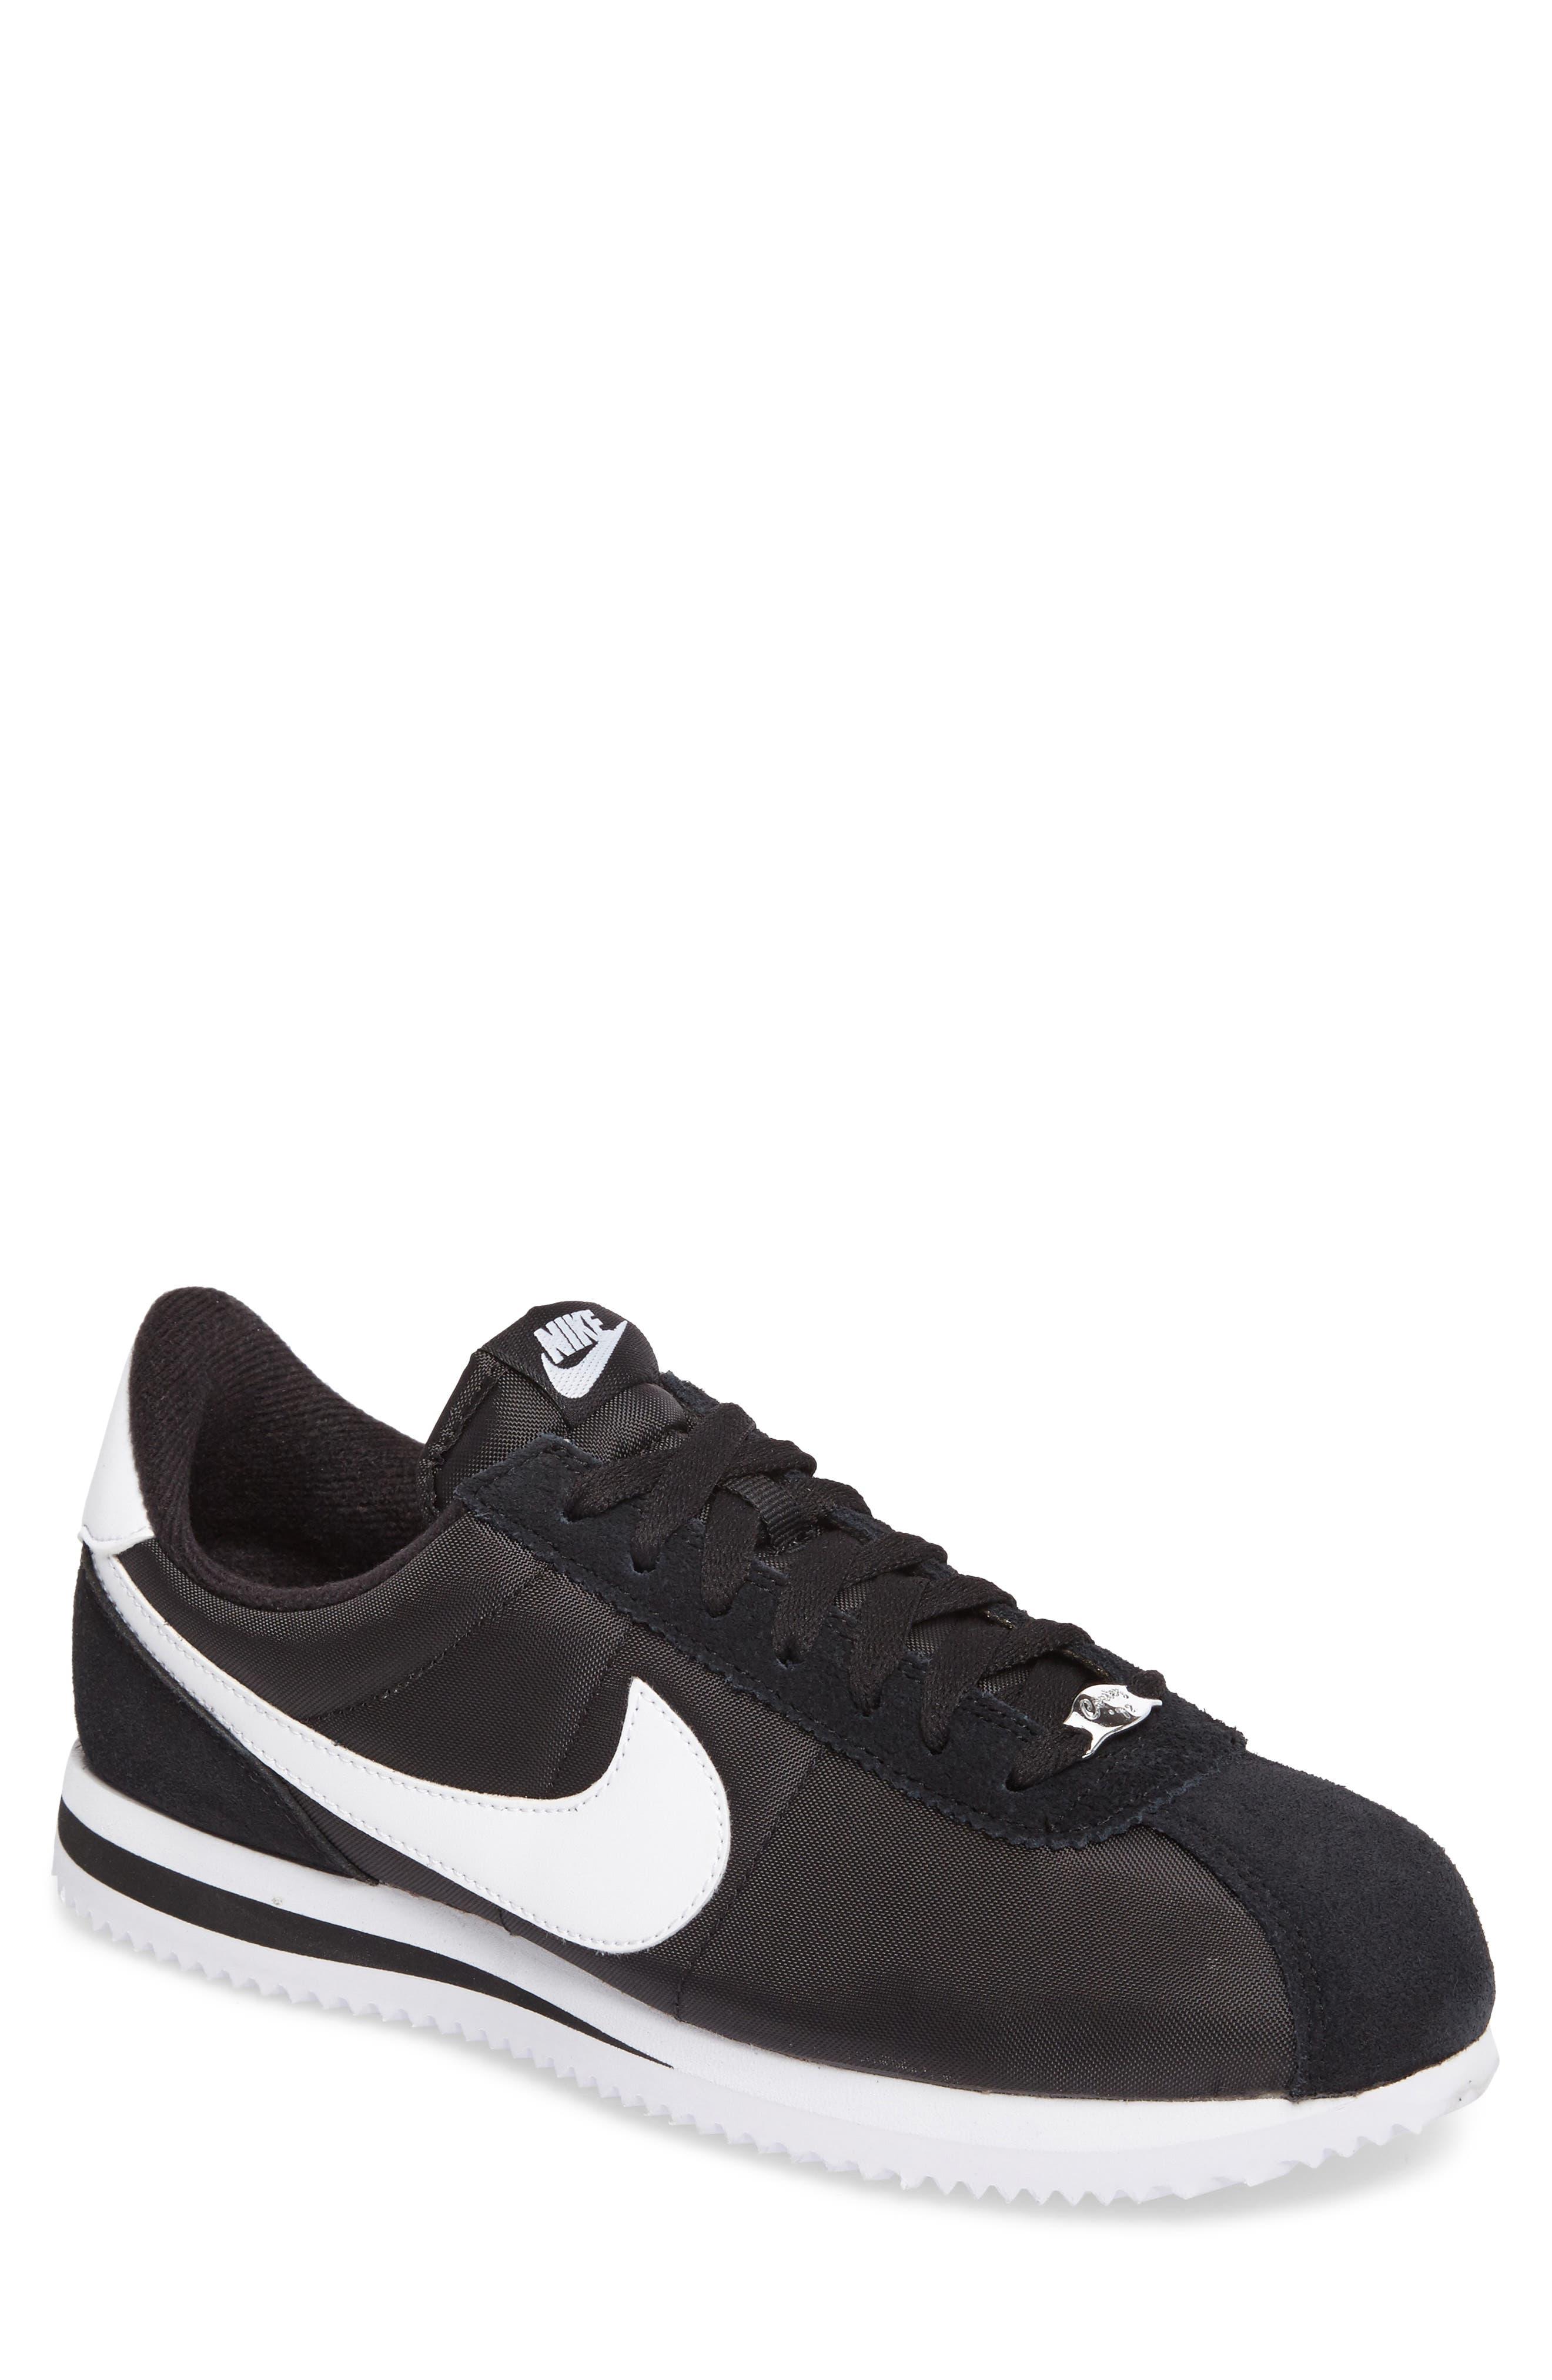 Cortez Basic Nylon Sneaker,                         Main,                         color, BLACK/WHITE/METALLIC SILVER